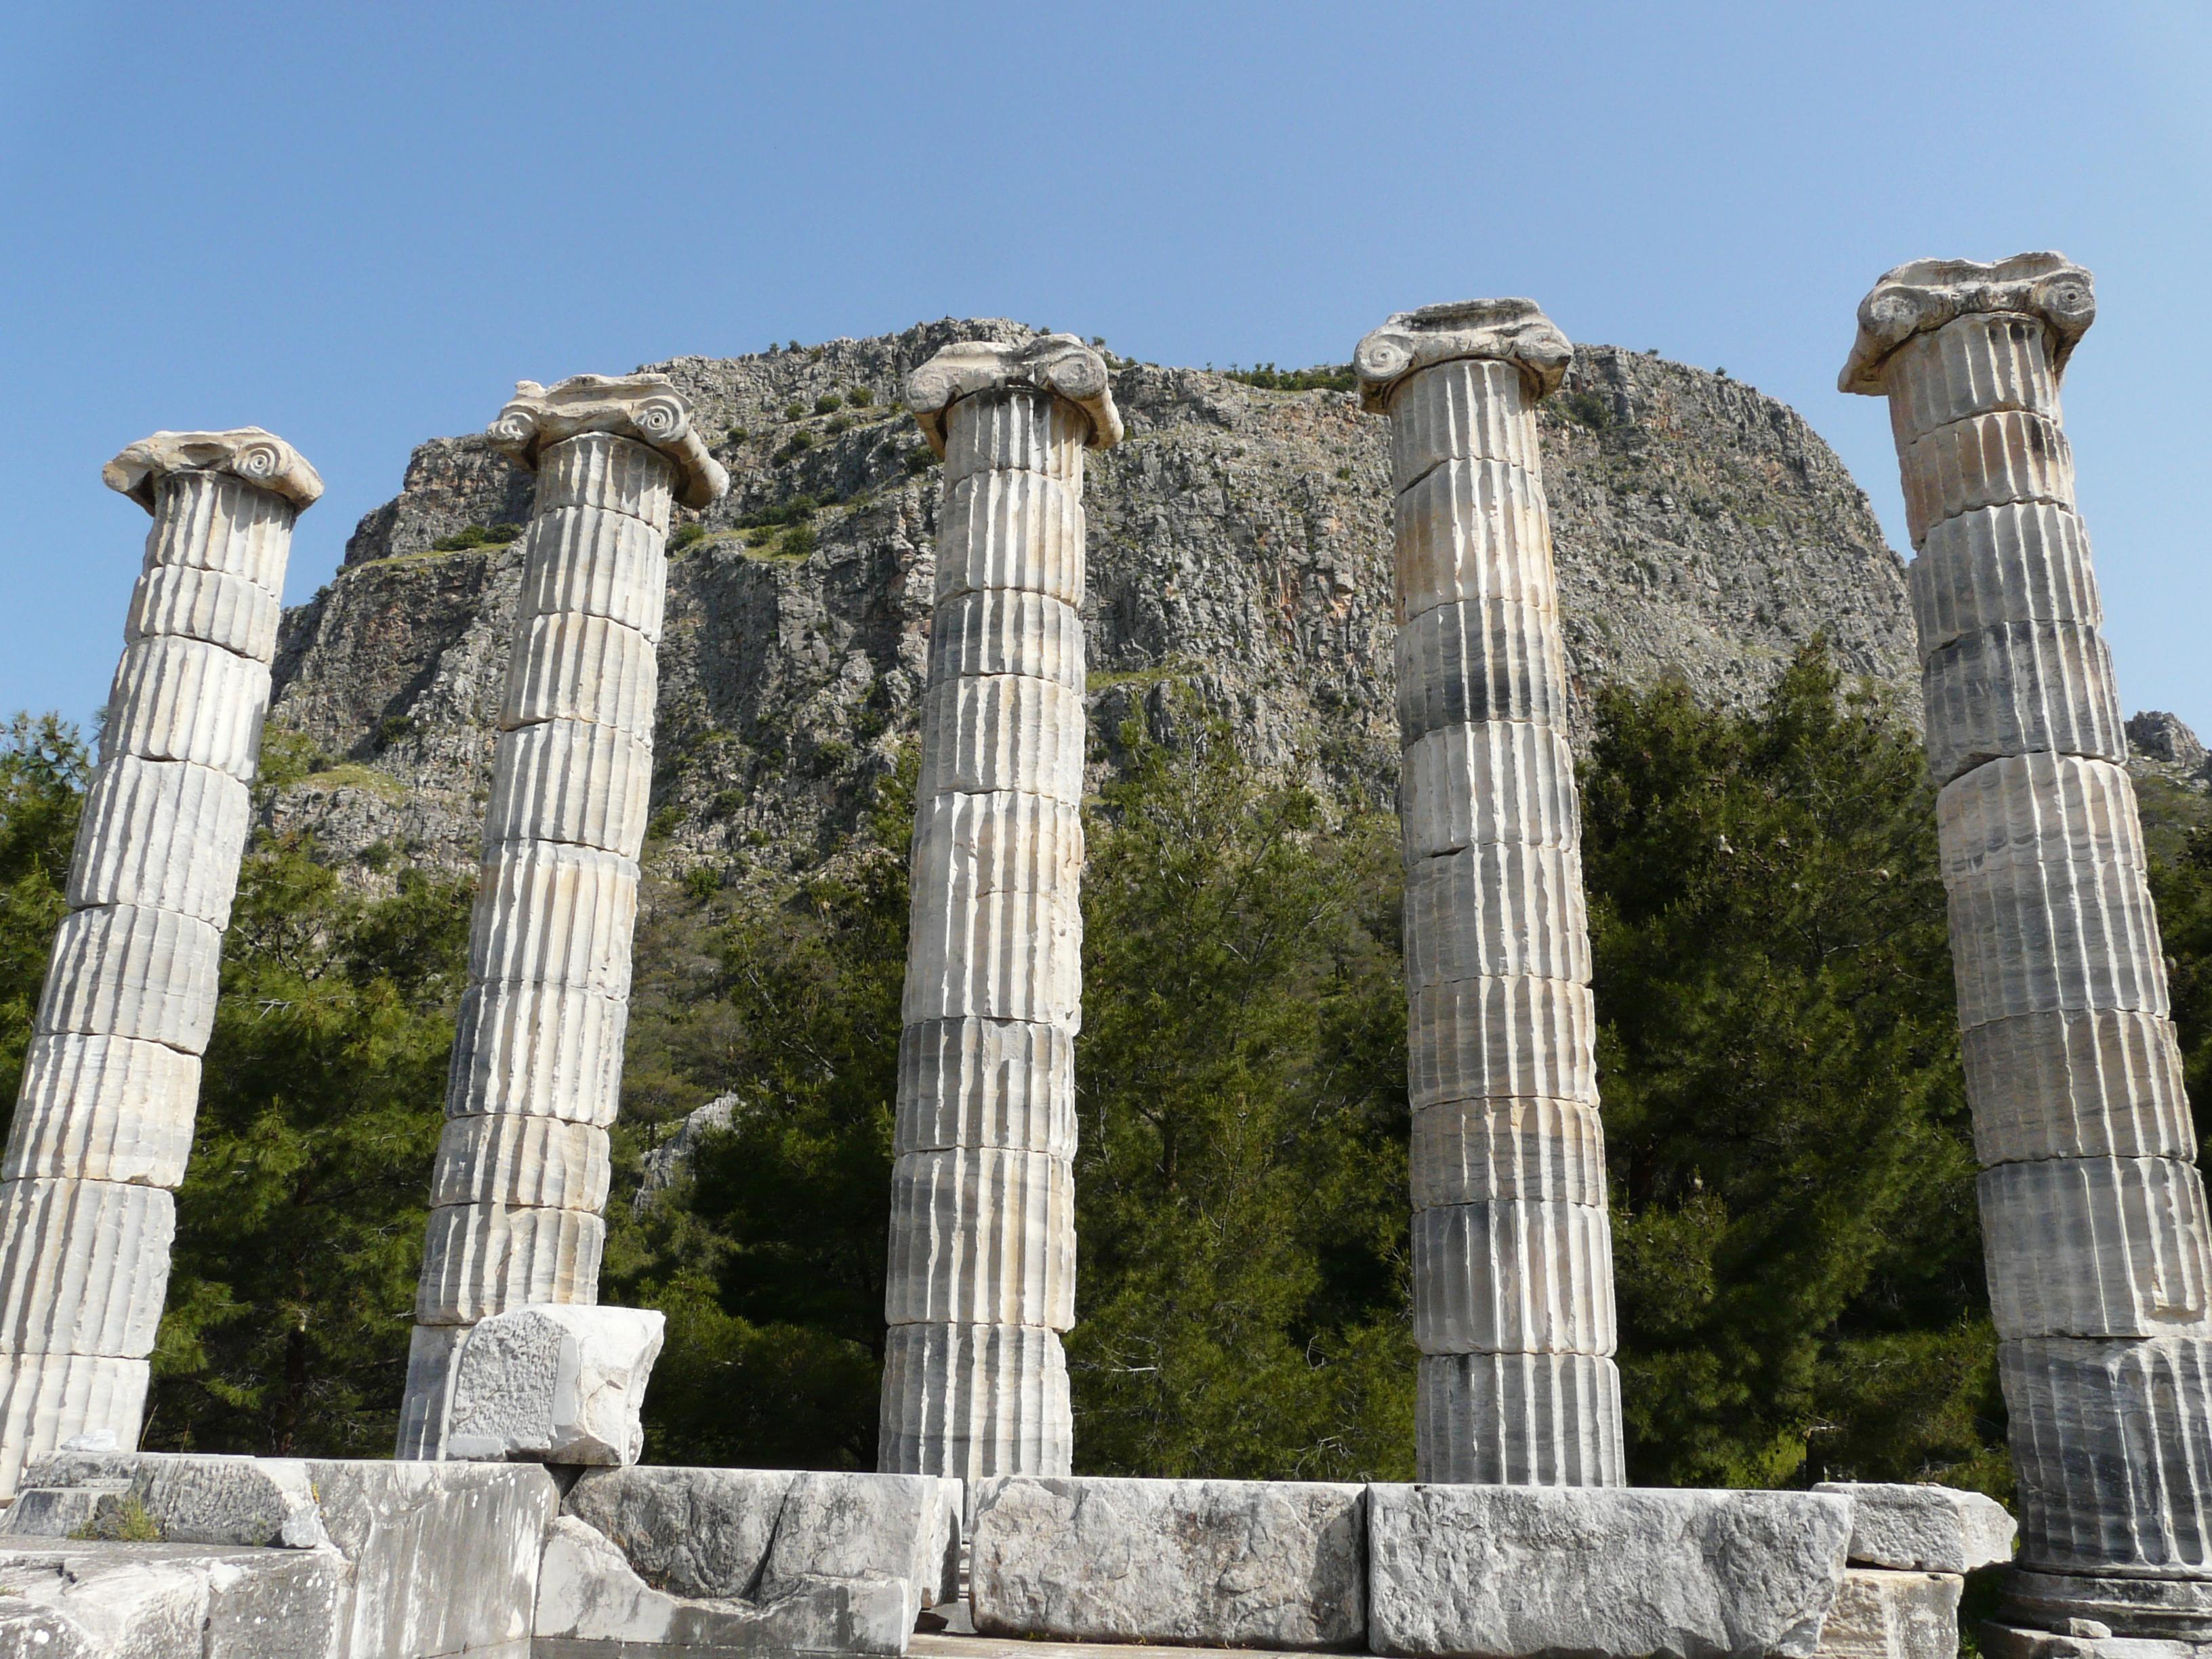 File:Athena temple at Priene.jpg - Wikimedia Commons